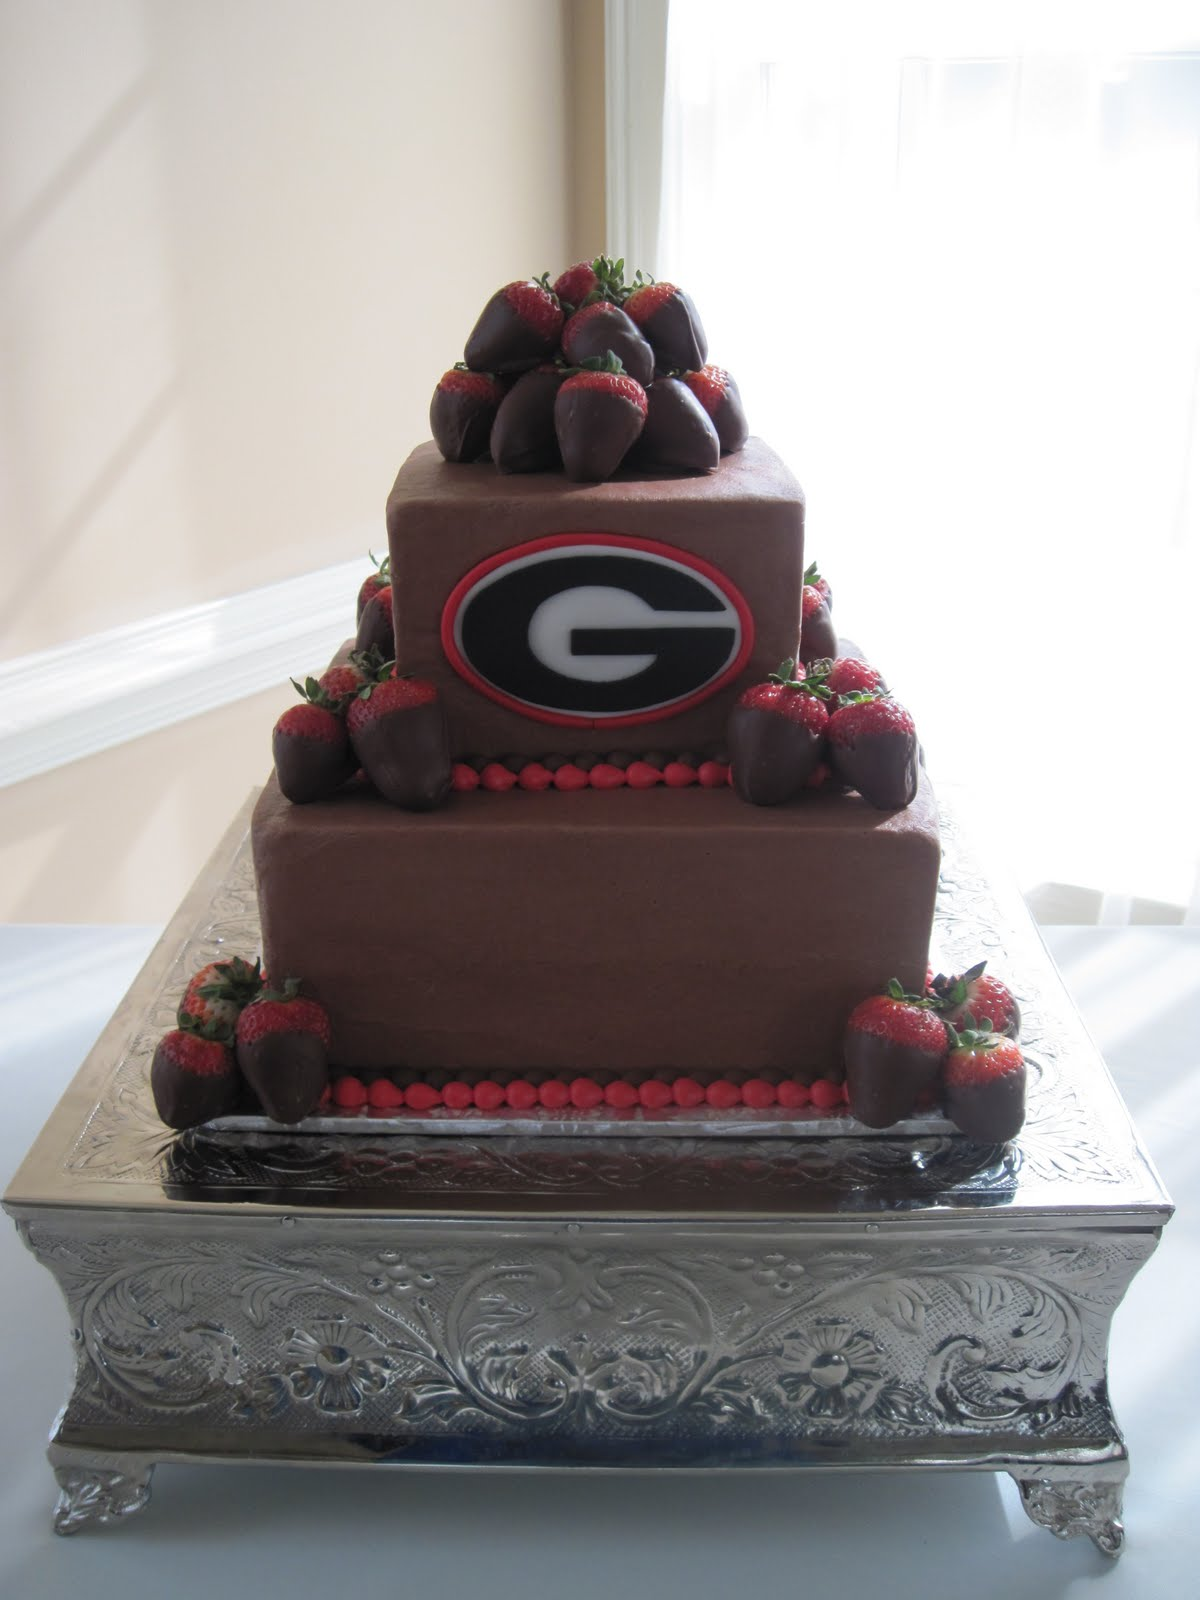 Yankee Cake On Pinterest Cakes Birthday Cakes And